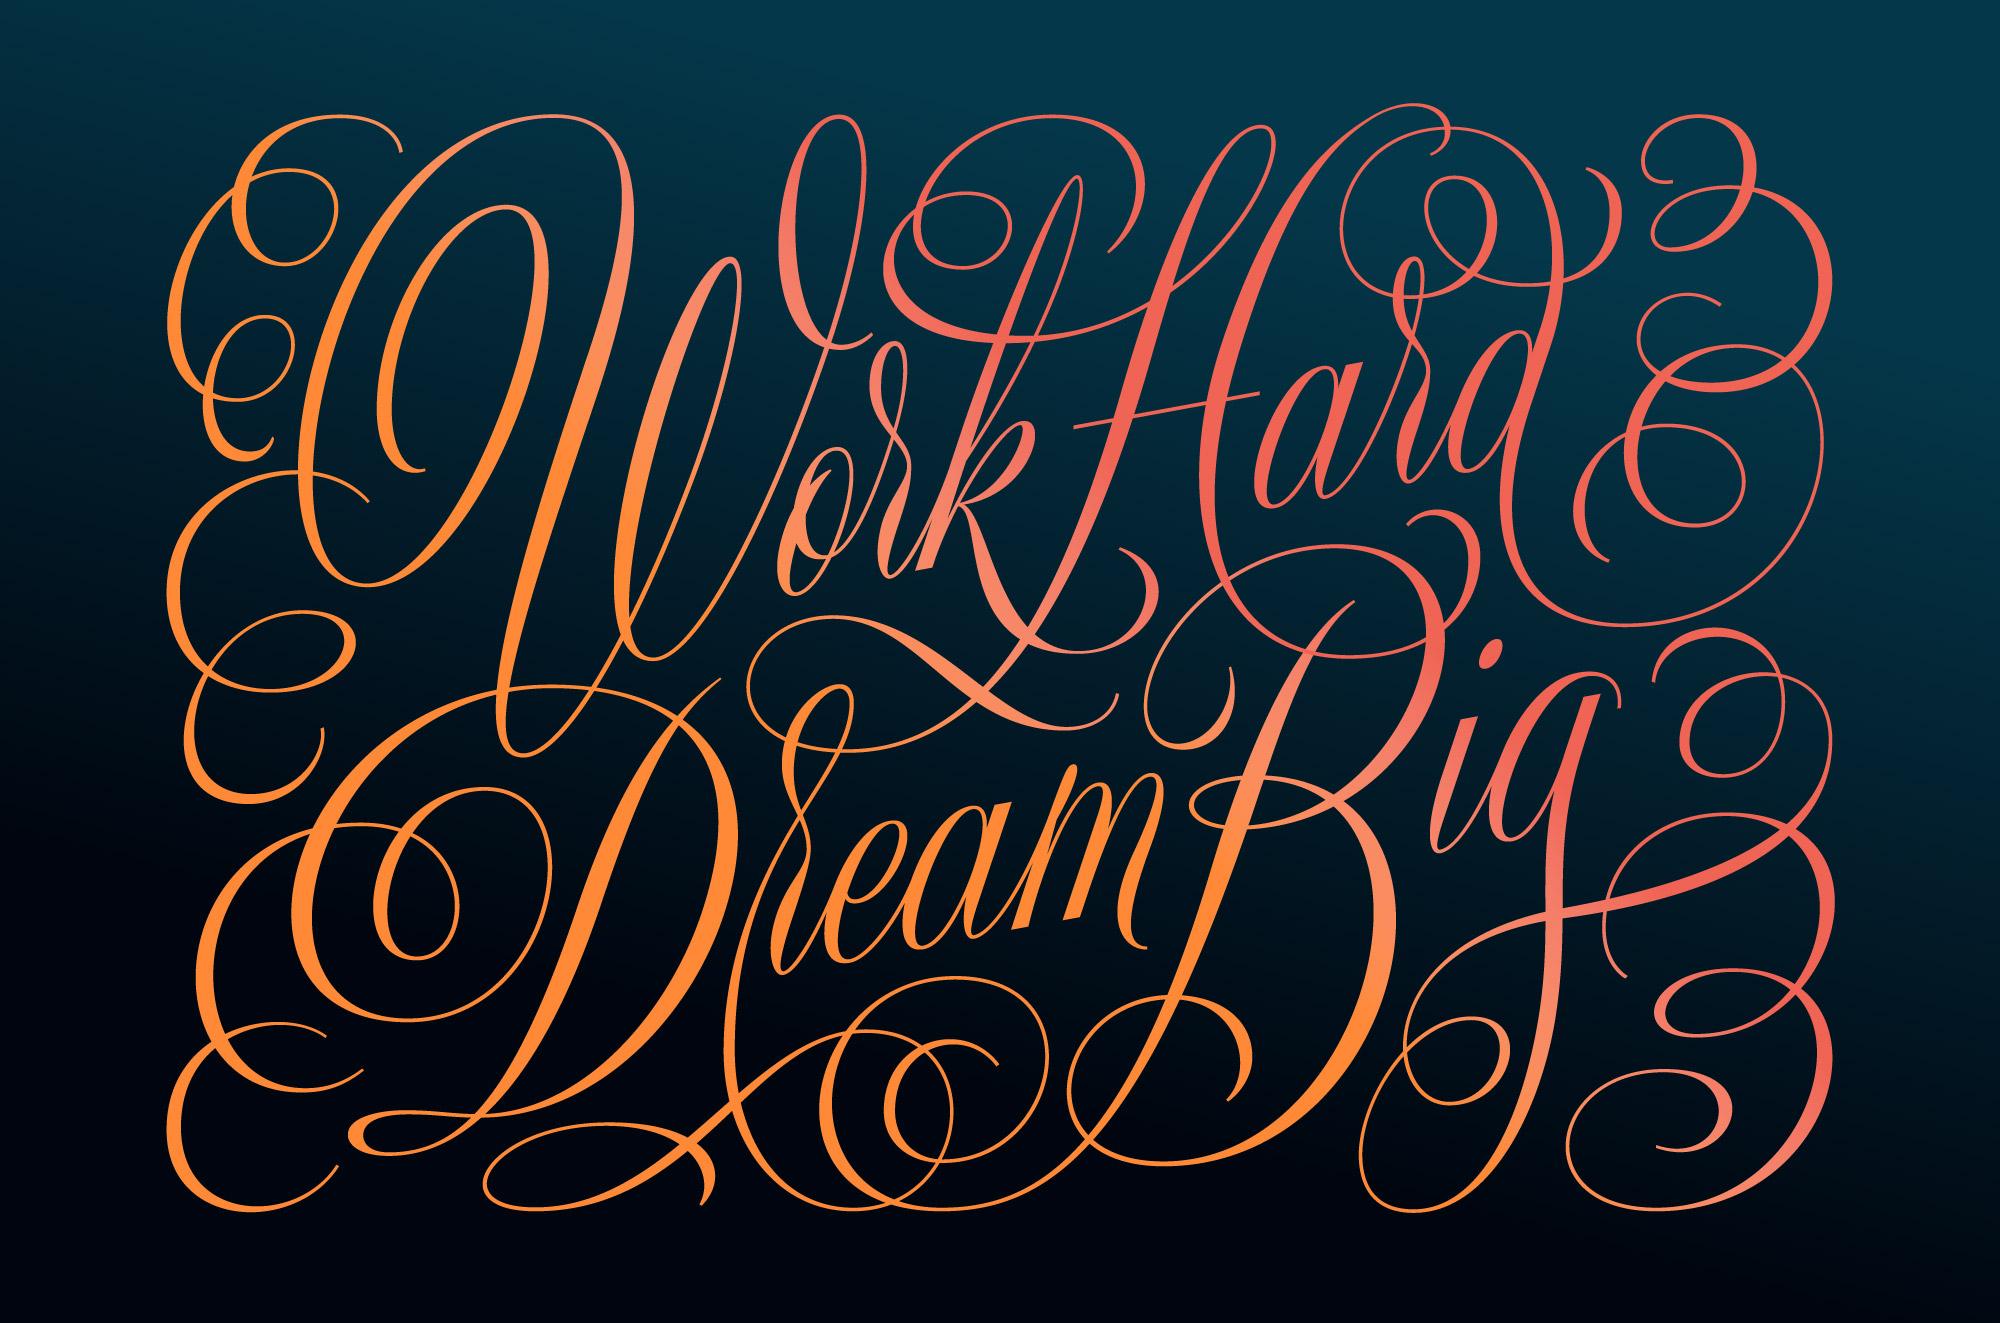 WORK-HARD-DREAM-BIG_Yanina-Arabena_Guillermo-Vizzari_02.jpg